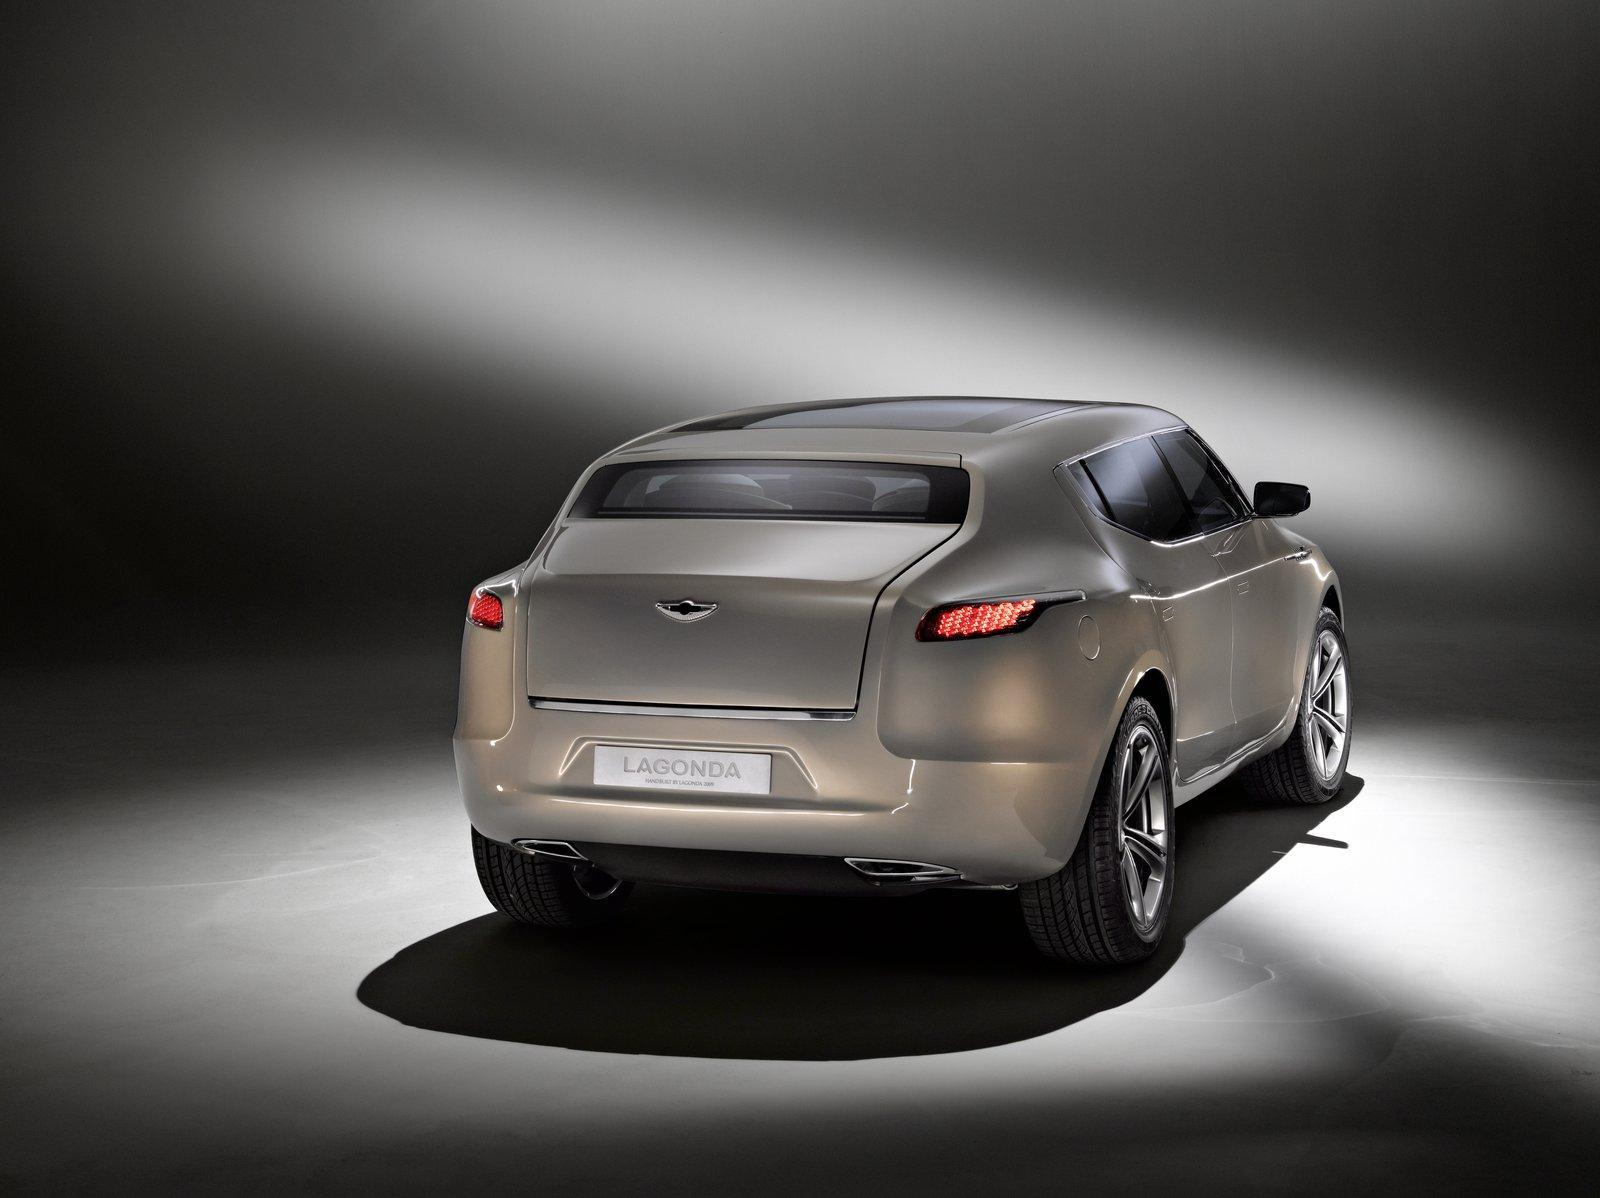 Aston Martin Lagonda Suv Only Cars And Cars